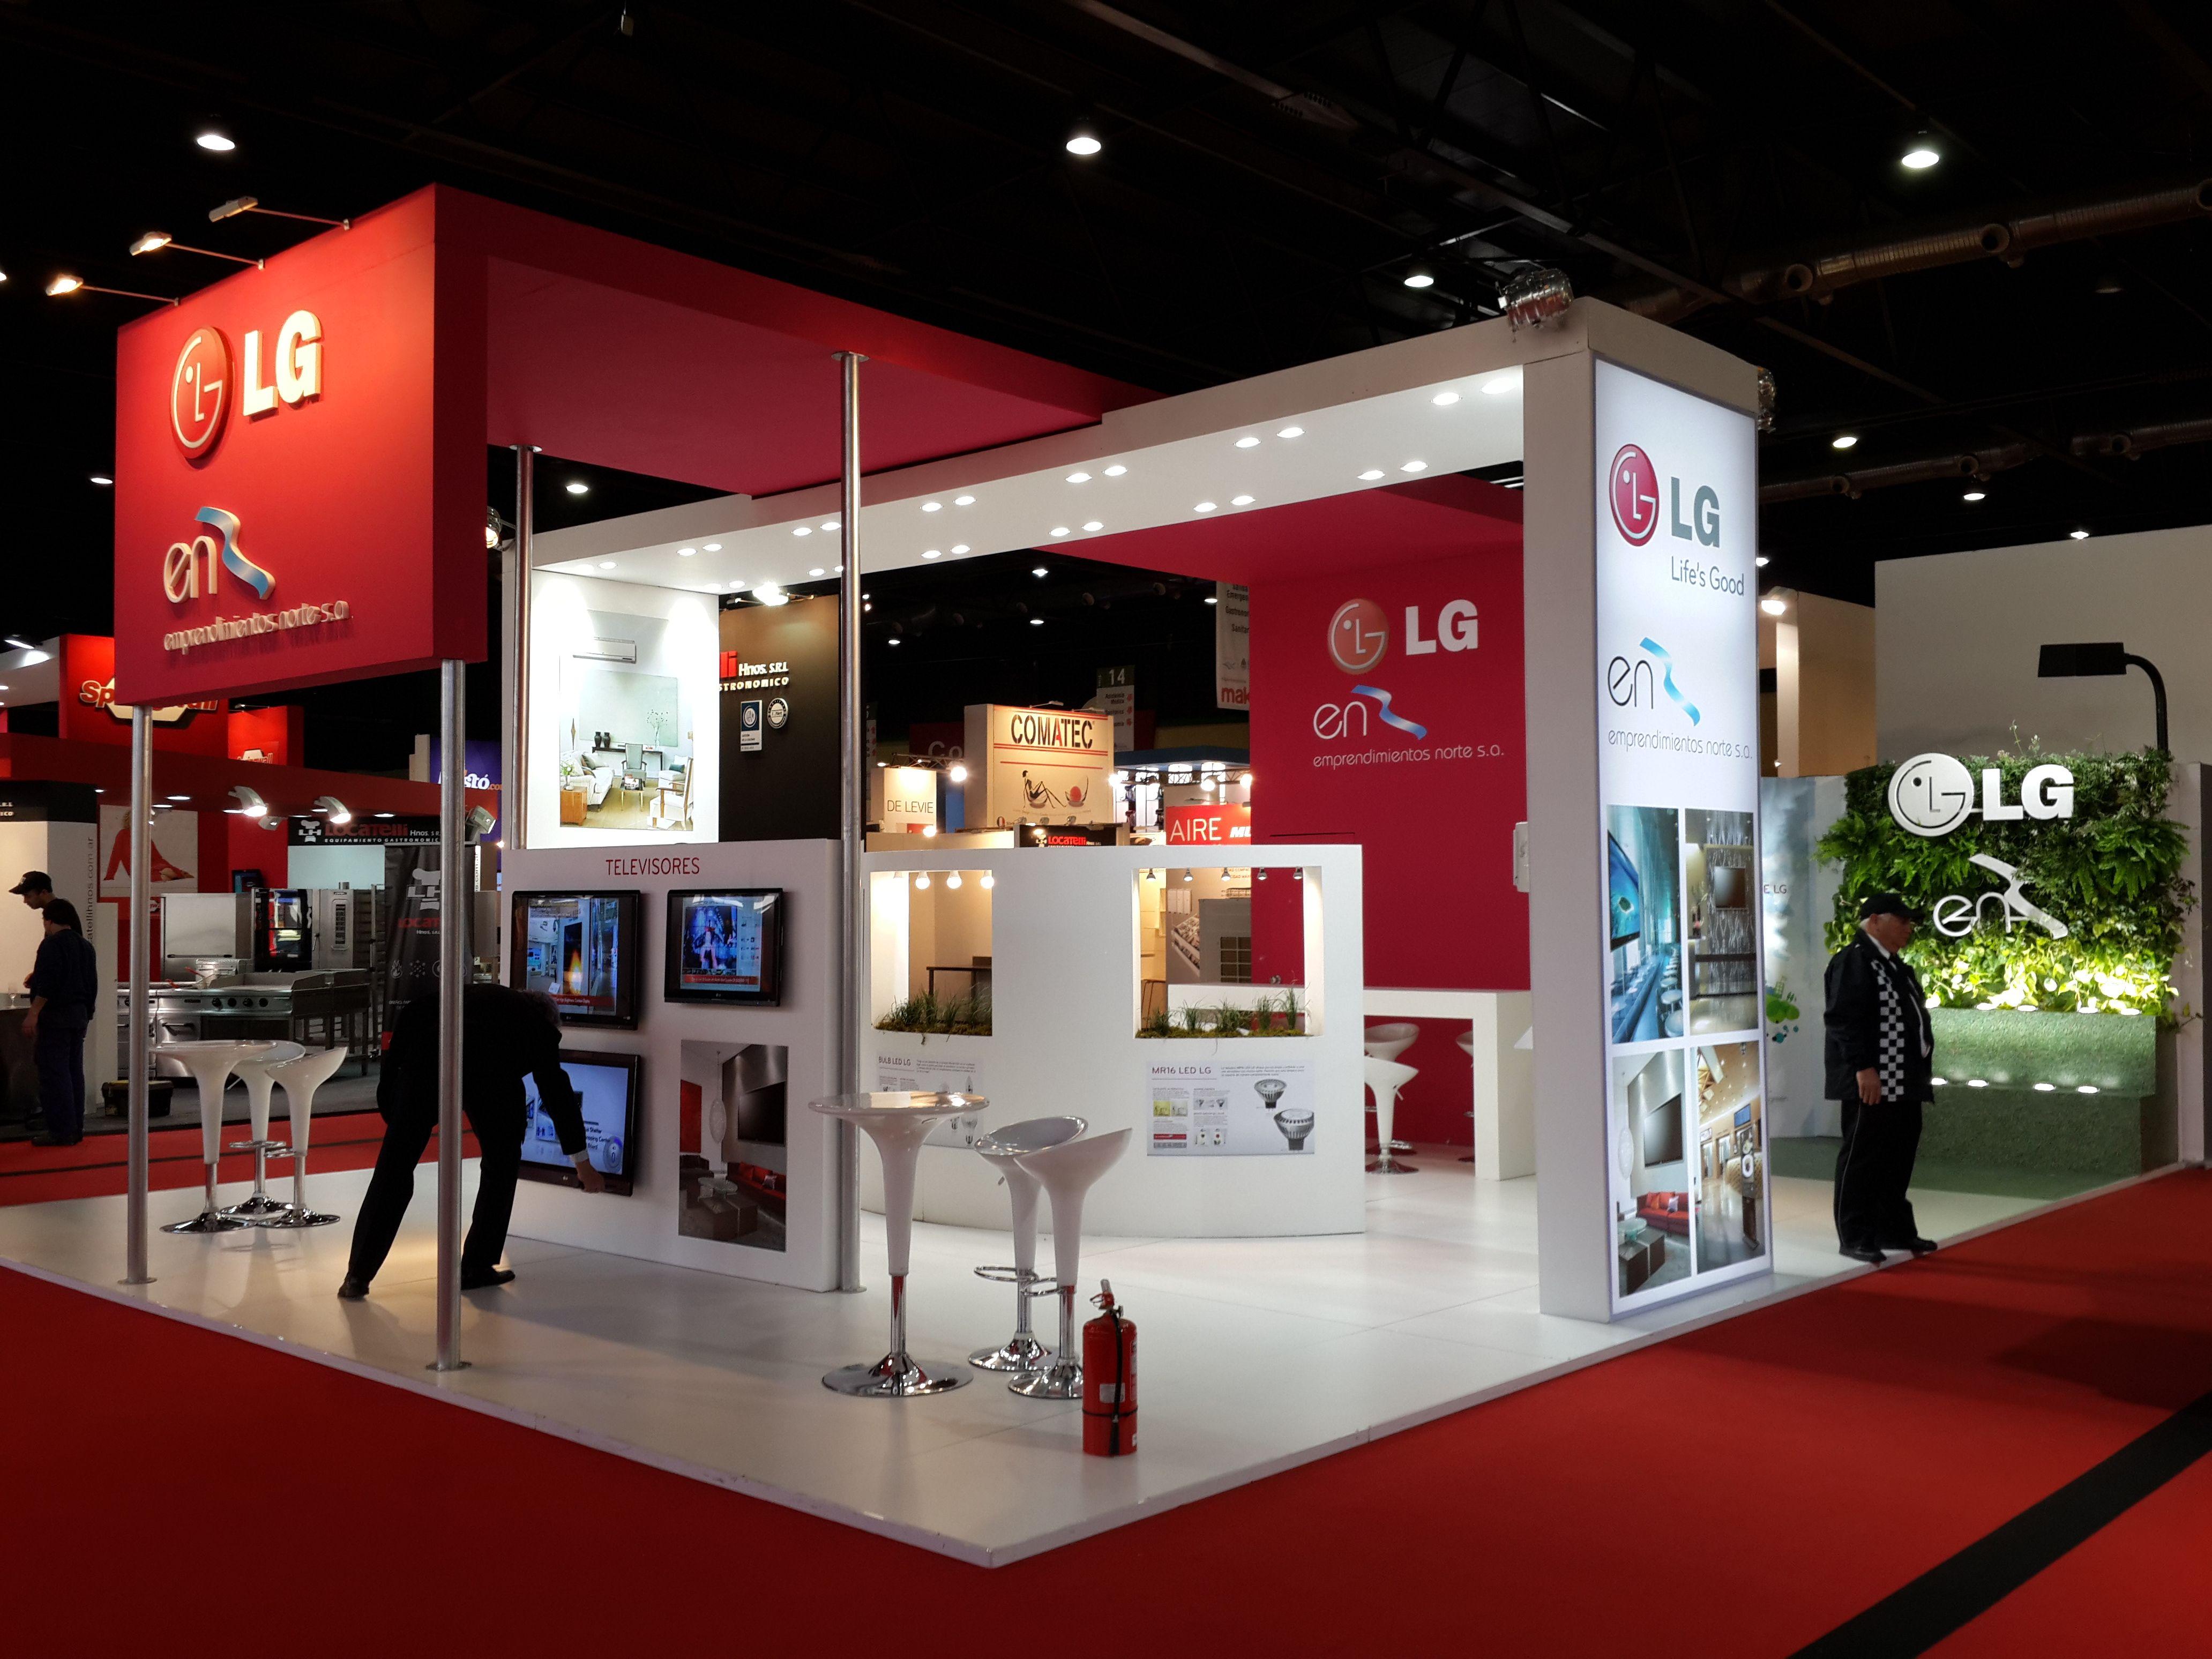 Expo Stands Kioska : Stand lg hotelga diseño y producción stands